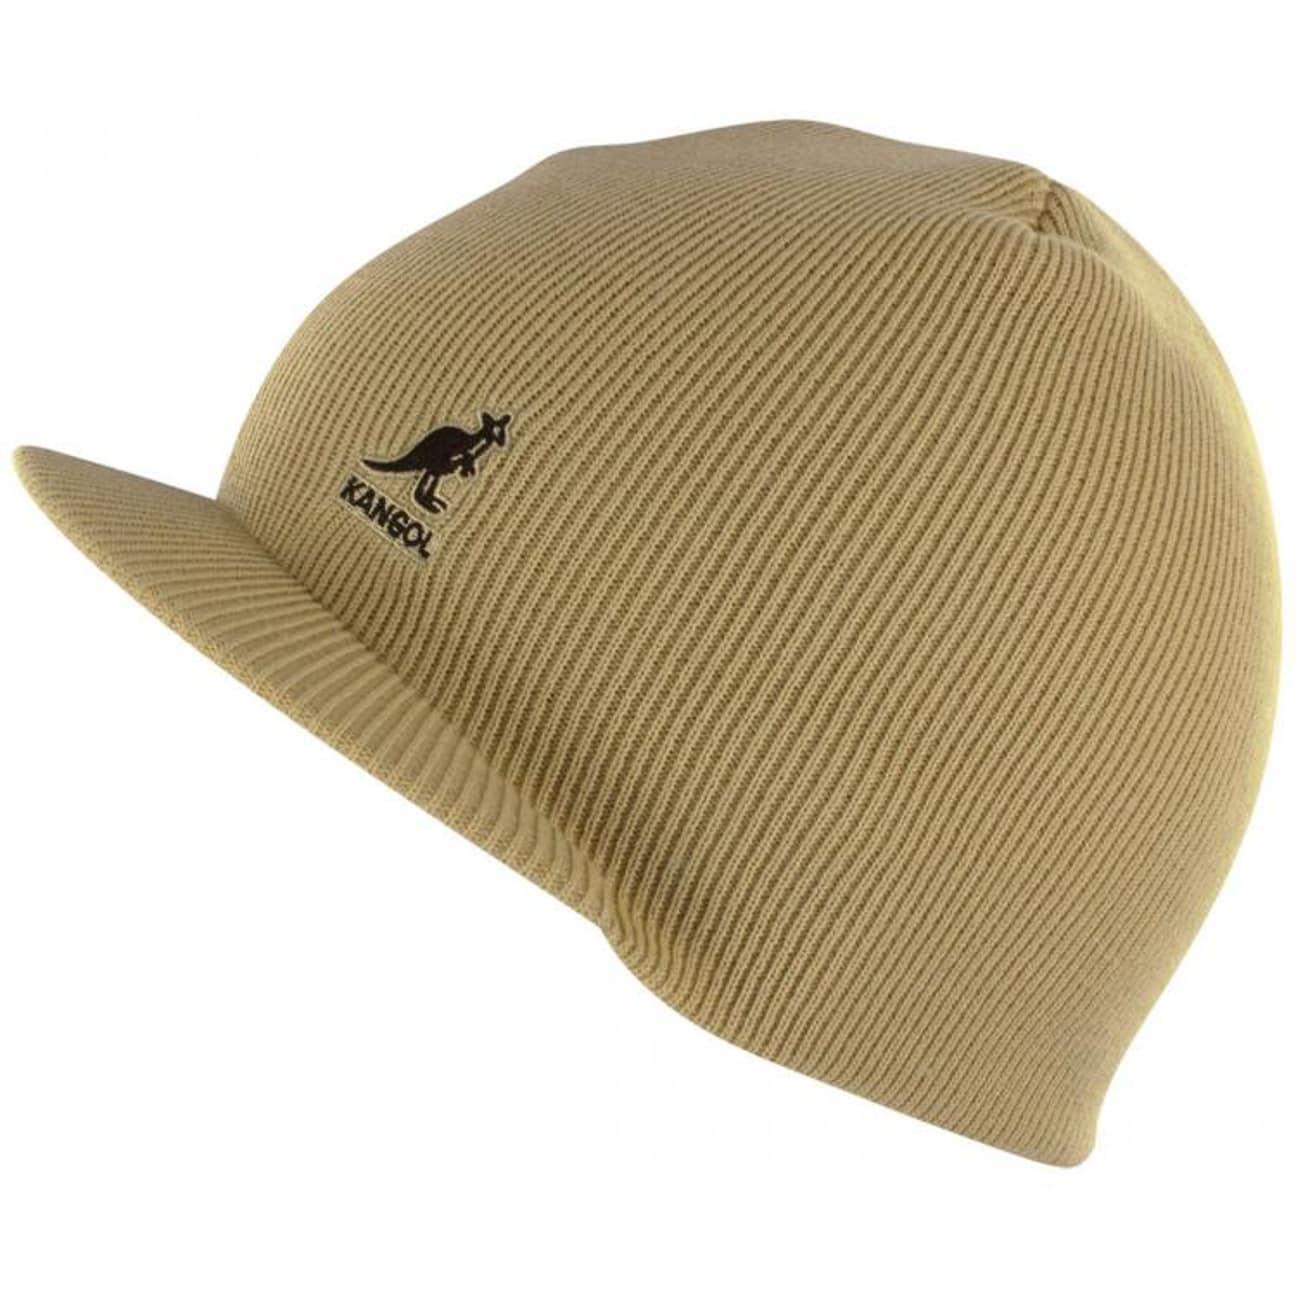 ... Kangol Acrylic Cuffless Pull On with Peak - beige 1 ... 9f6a0faf2254